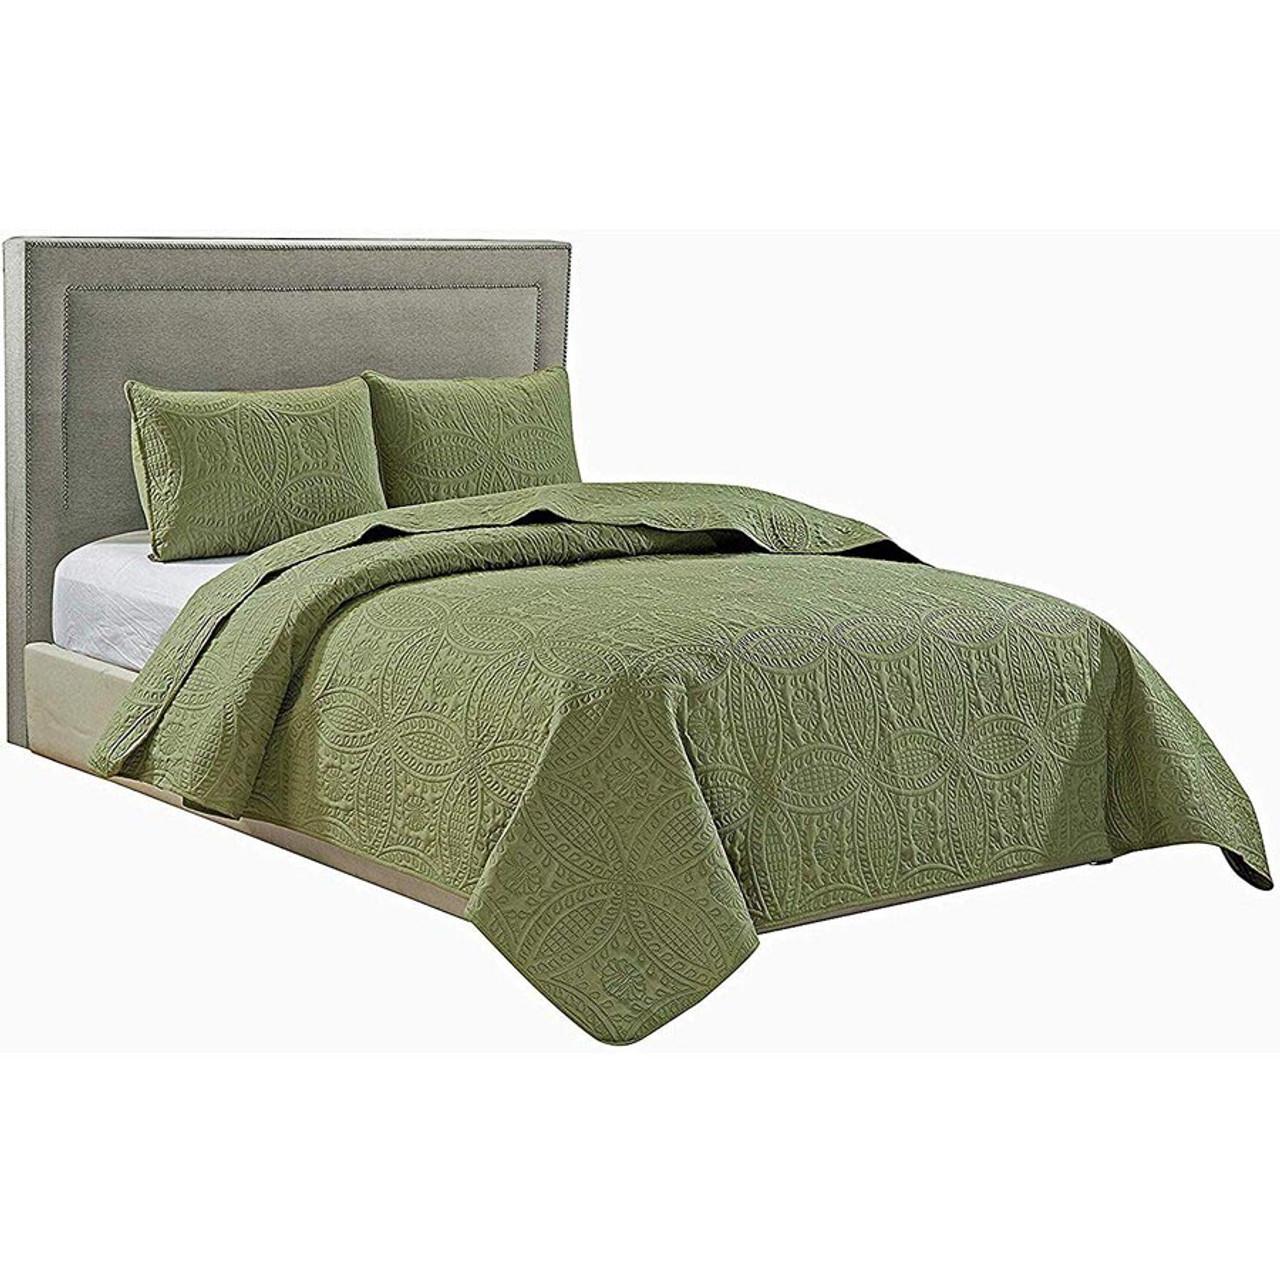 Bedding Bedspread Coverlet 3 Pcs Set Oversize Queen Or King Size 8 Colors Home Garden Mbln Org